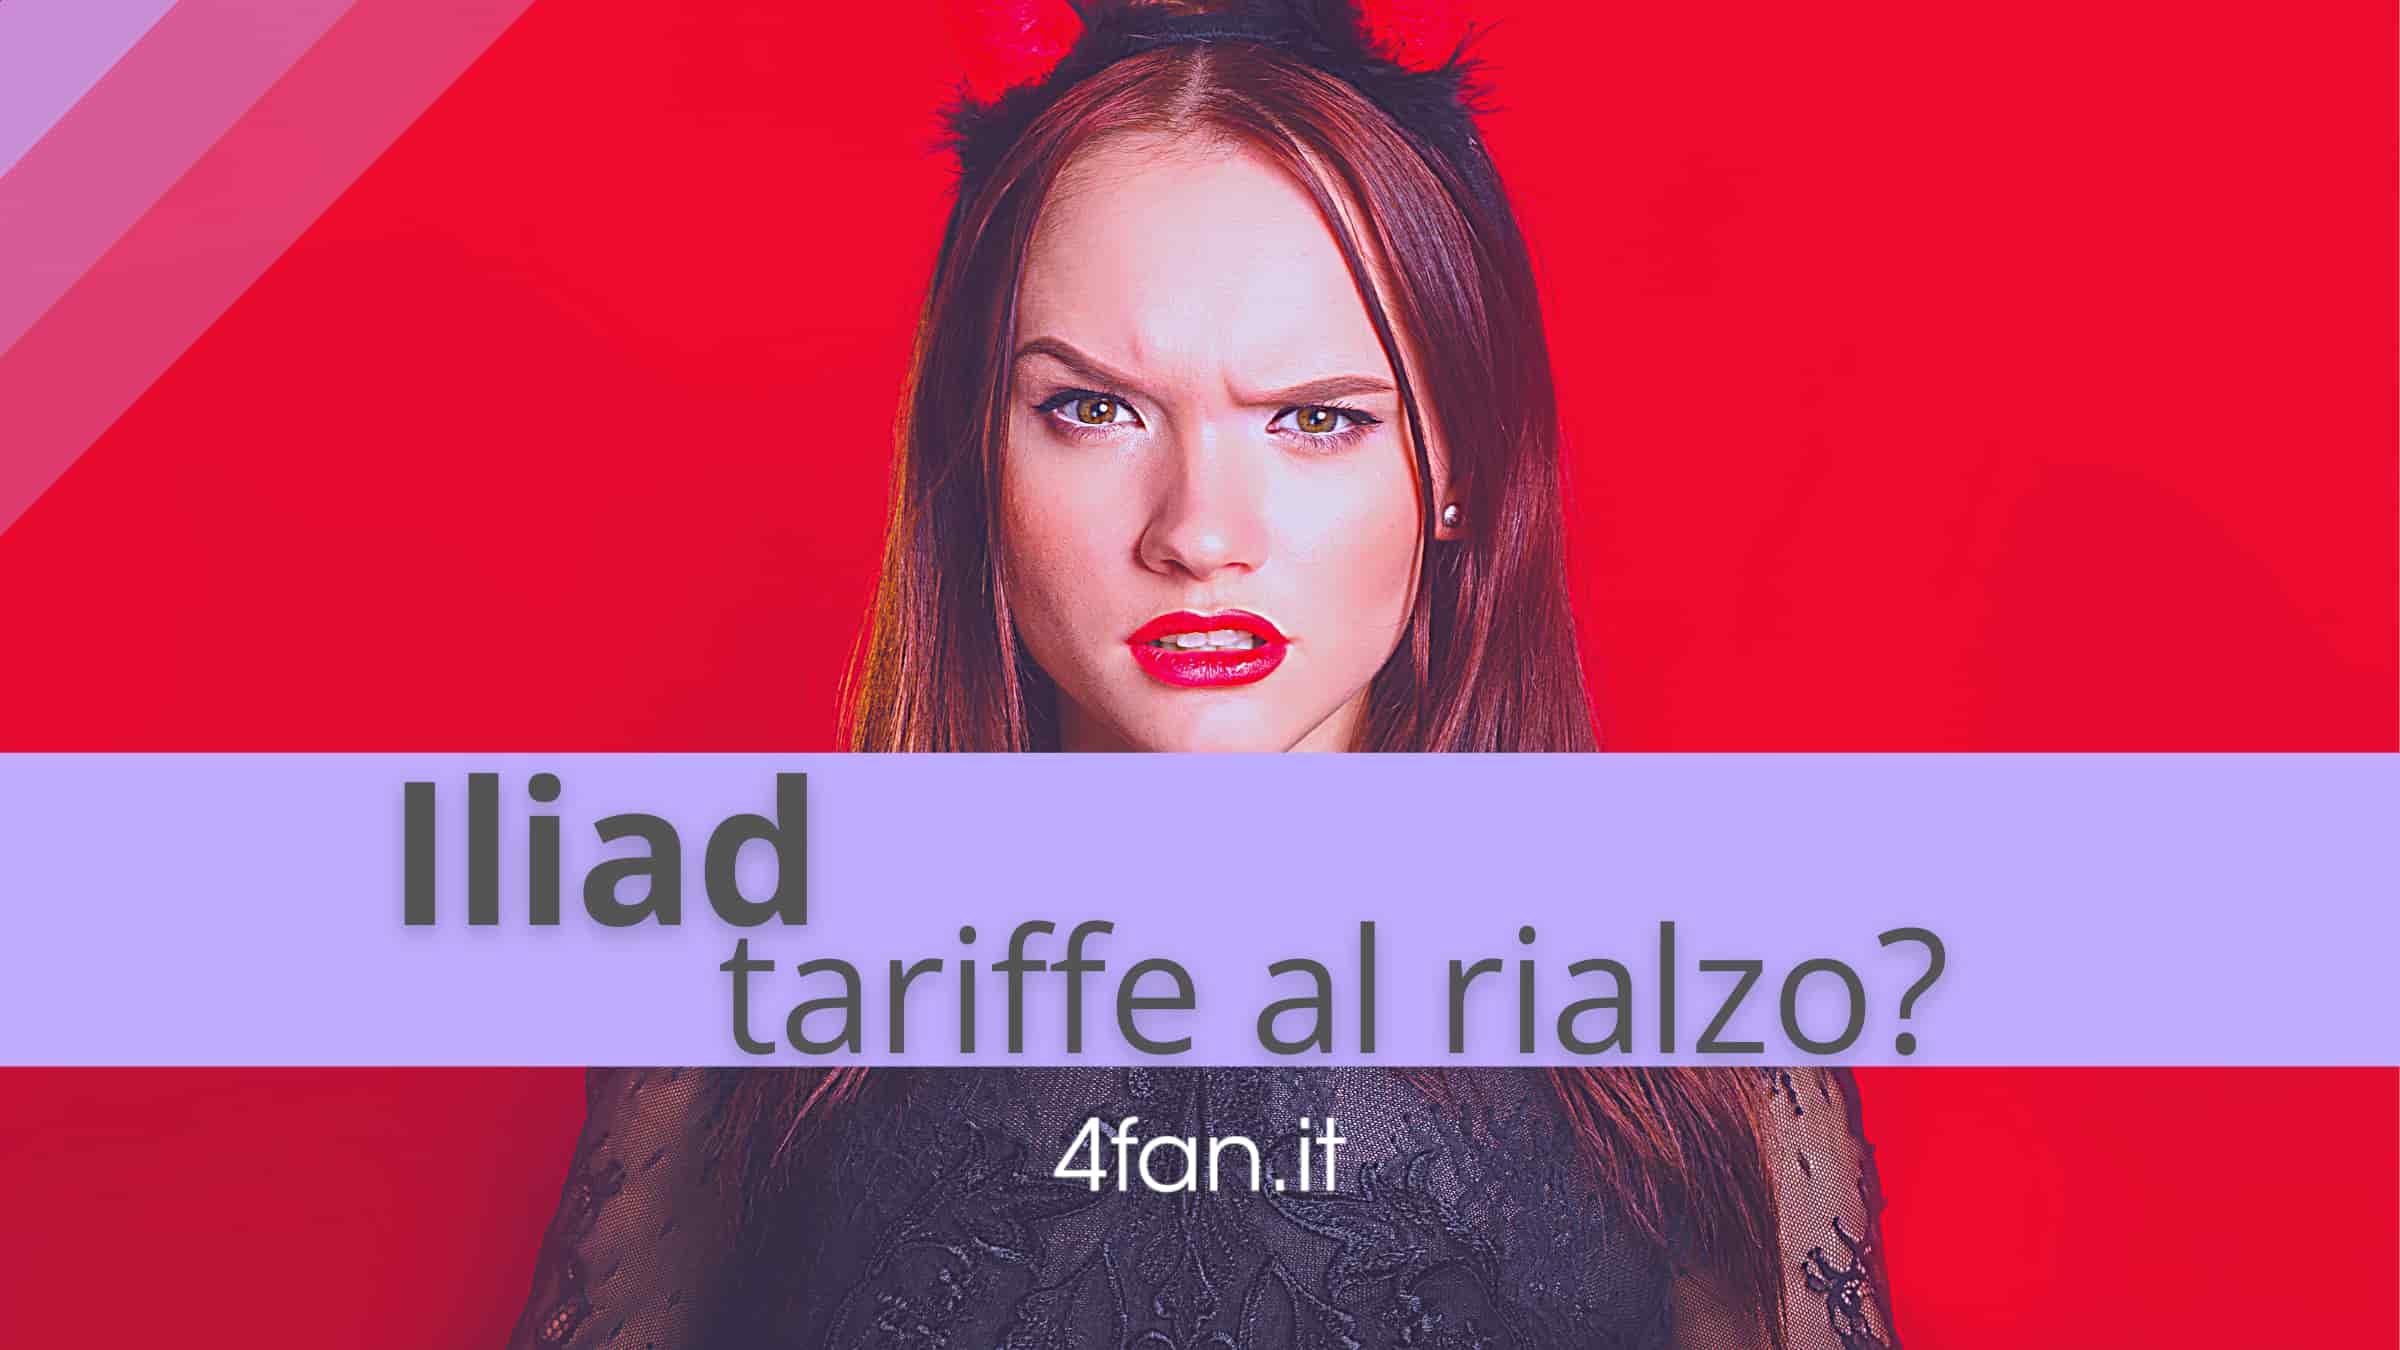 Iliad tariffe al rialzo